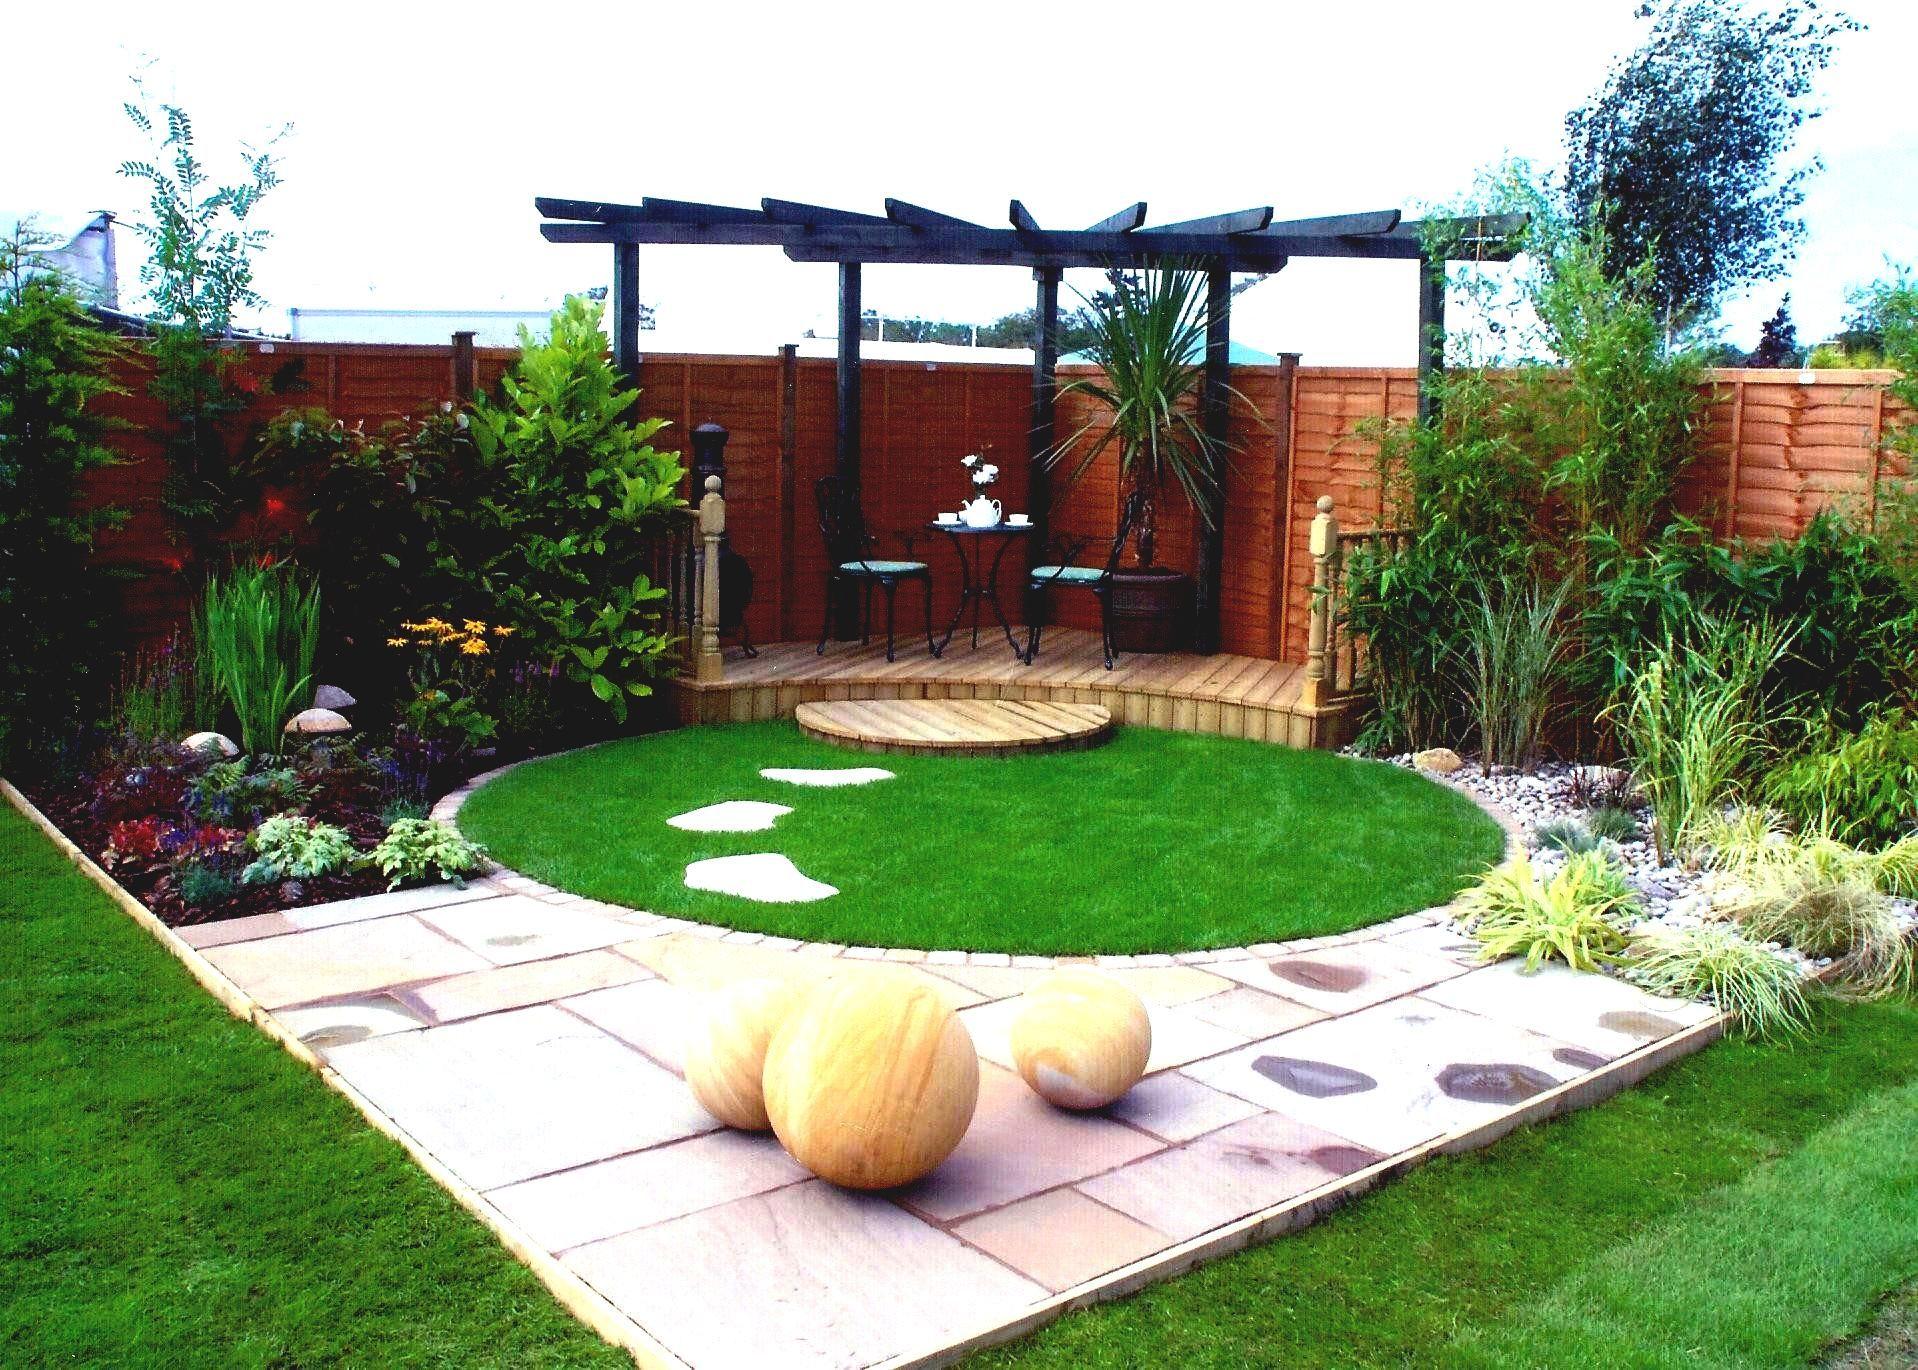 Small Gardens Beautiful Ile Ilgili G Rsel Sonucu